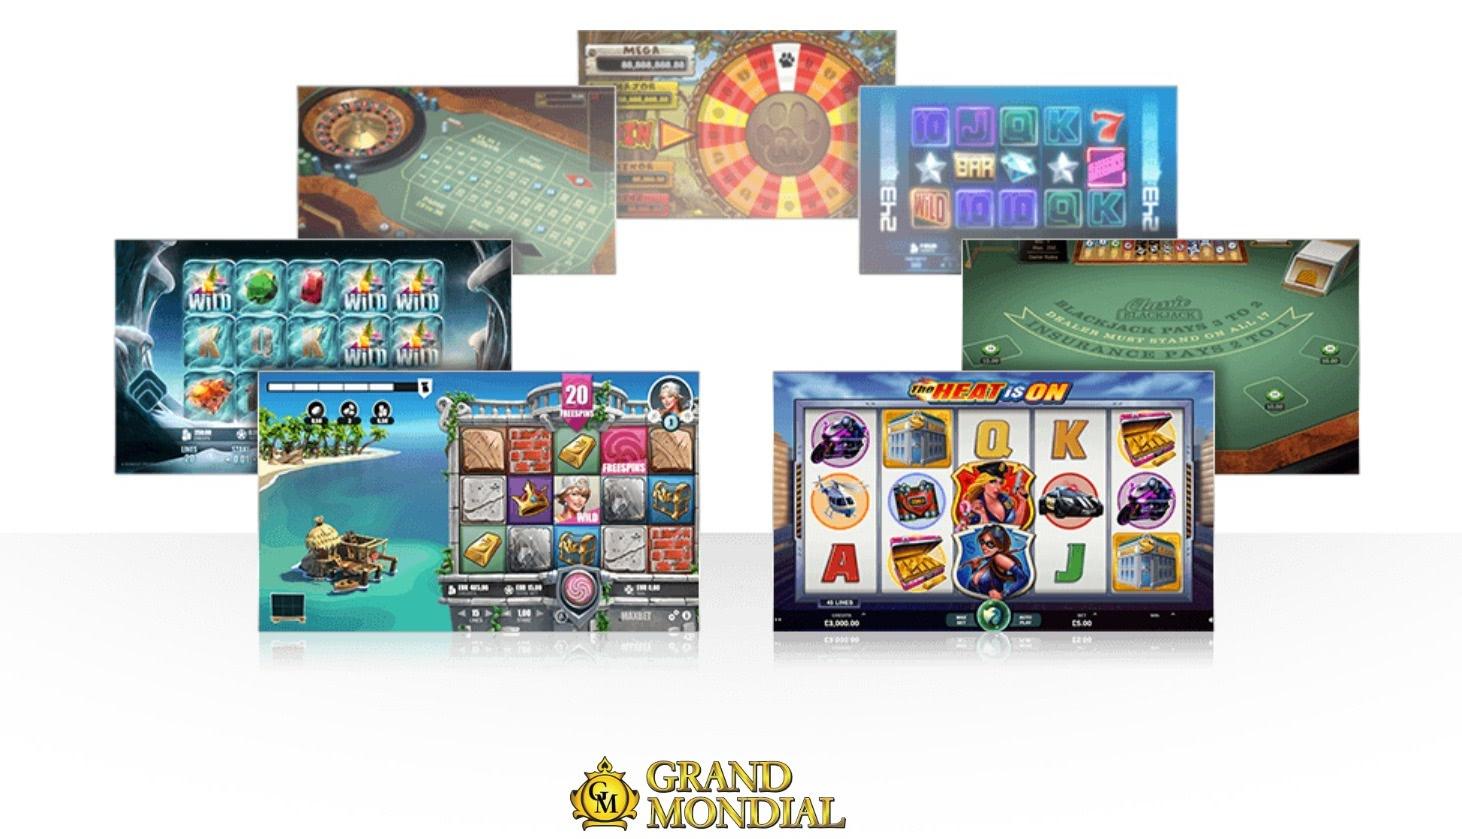 grand mondial casino jeux